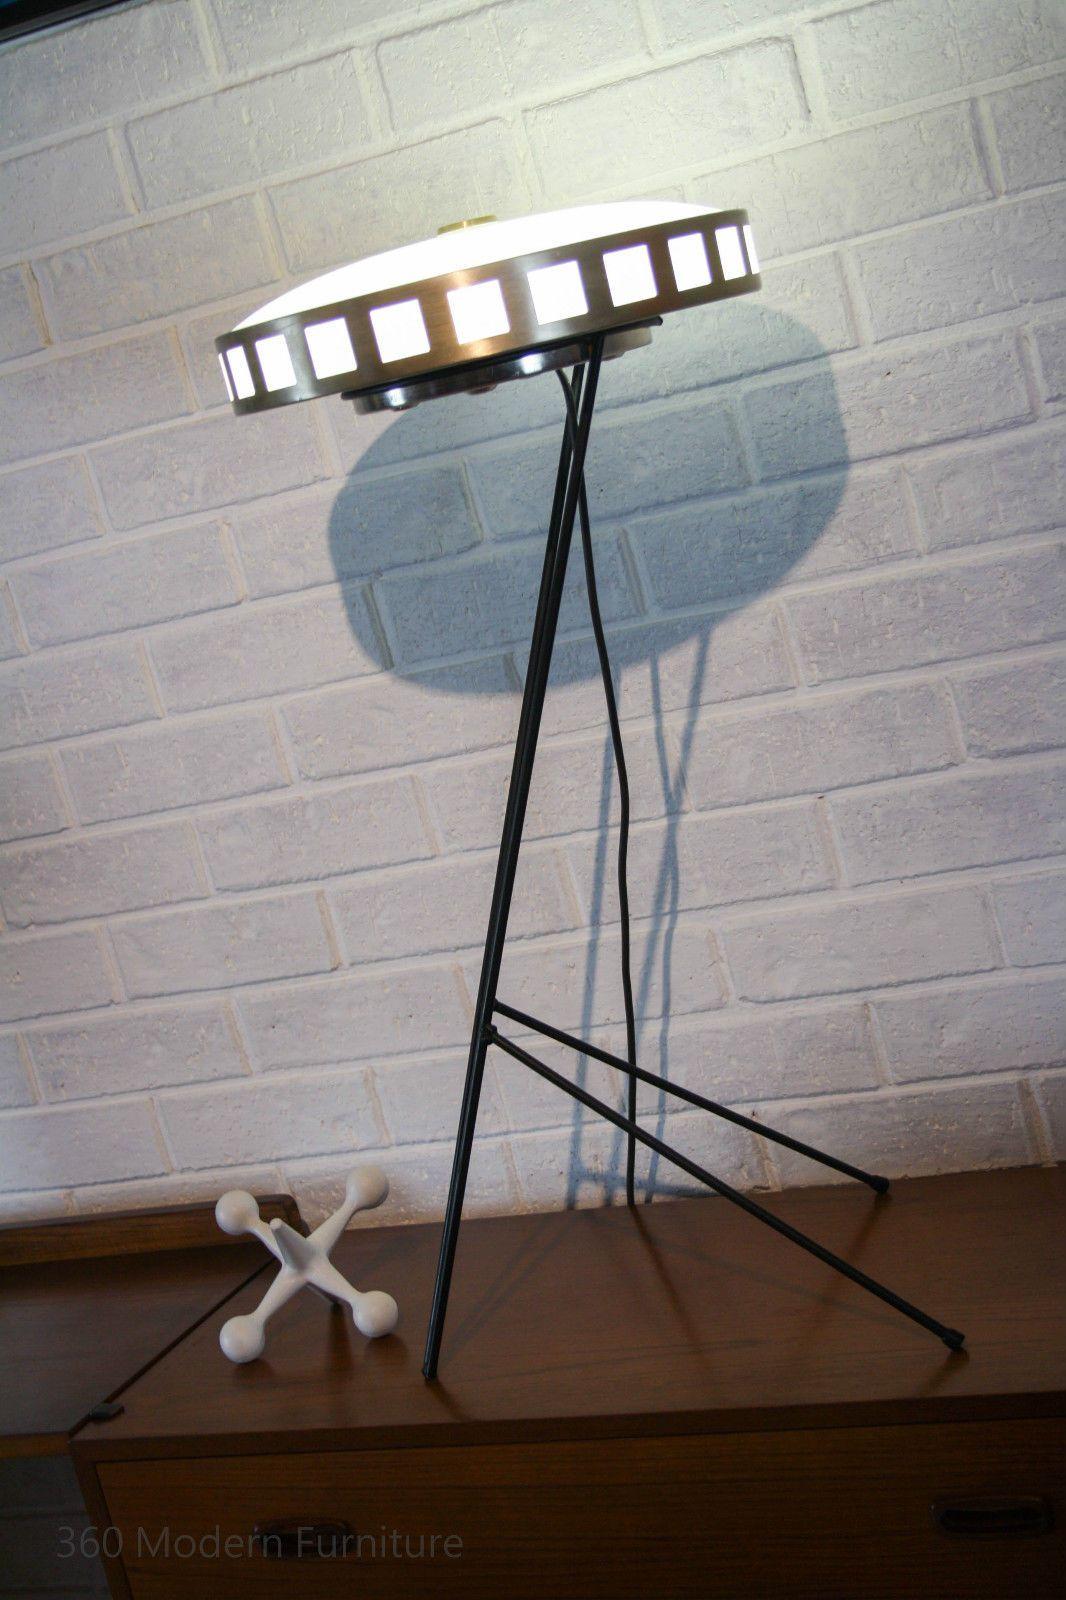 Kempthorne lighting 1950s australia lamp shade with custom hairpin kempthorne lighting australia lamp shade with custom hairpin stand mid century modern floor table ufo lamp retro vintage danish sputnik atomic standard aloadofball Choice Image